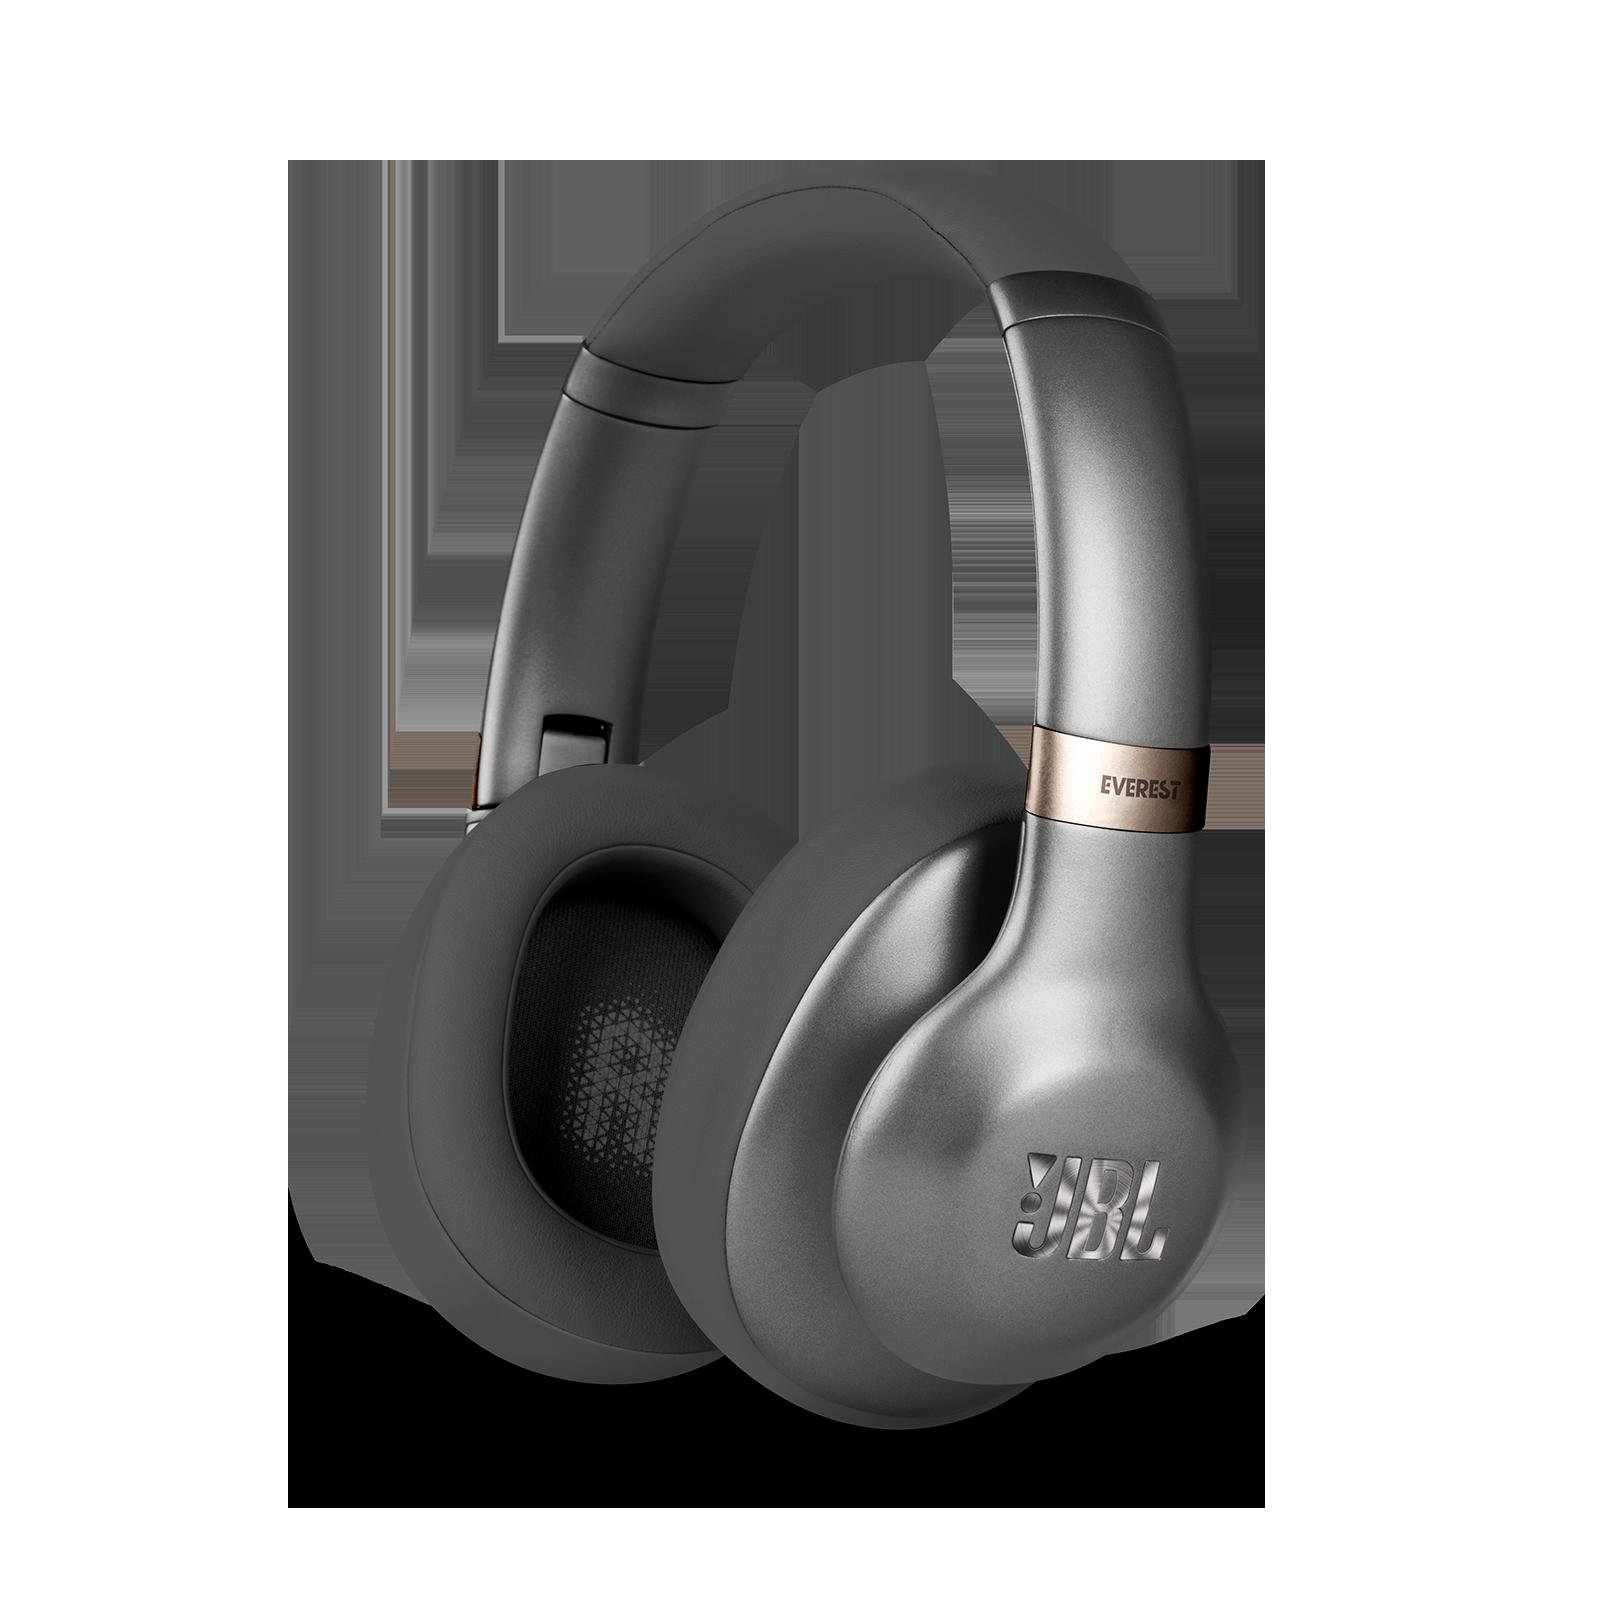 JBL EVEREST™ 710GA - Gun Metal - Wireless over-ear headphones - Hero